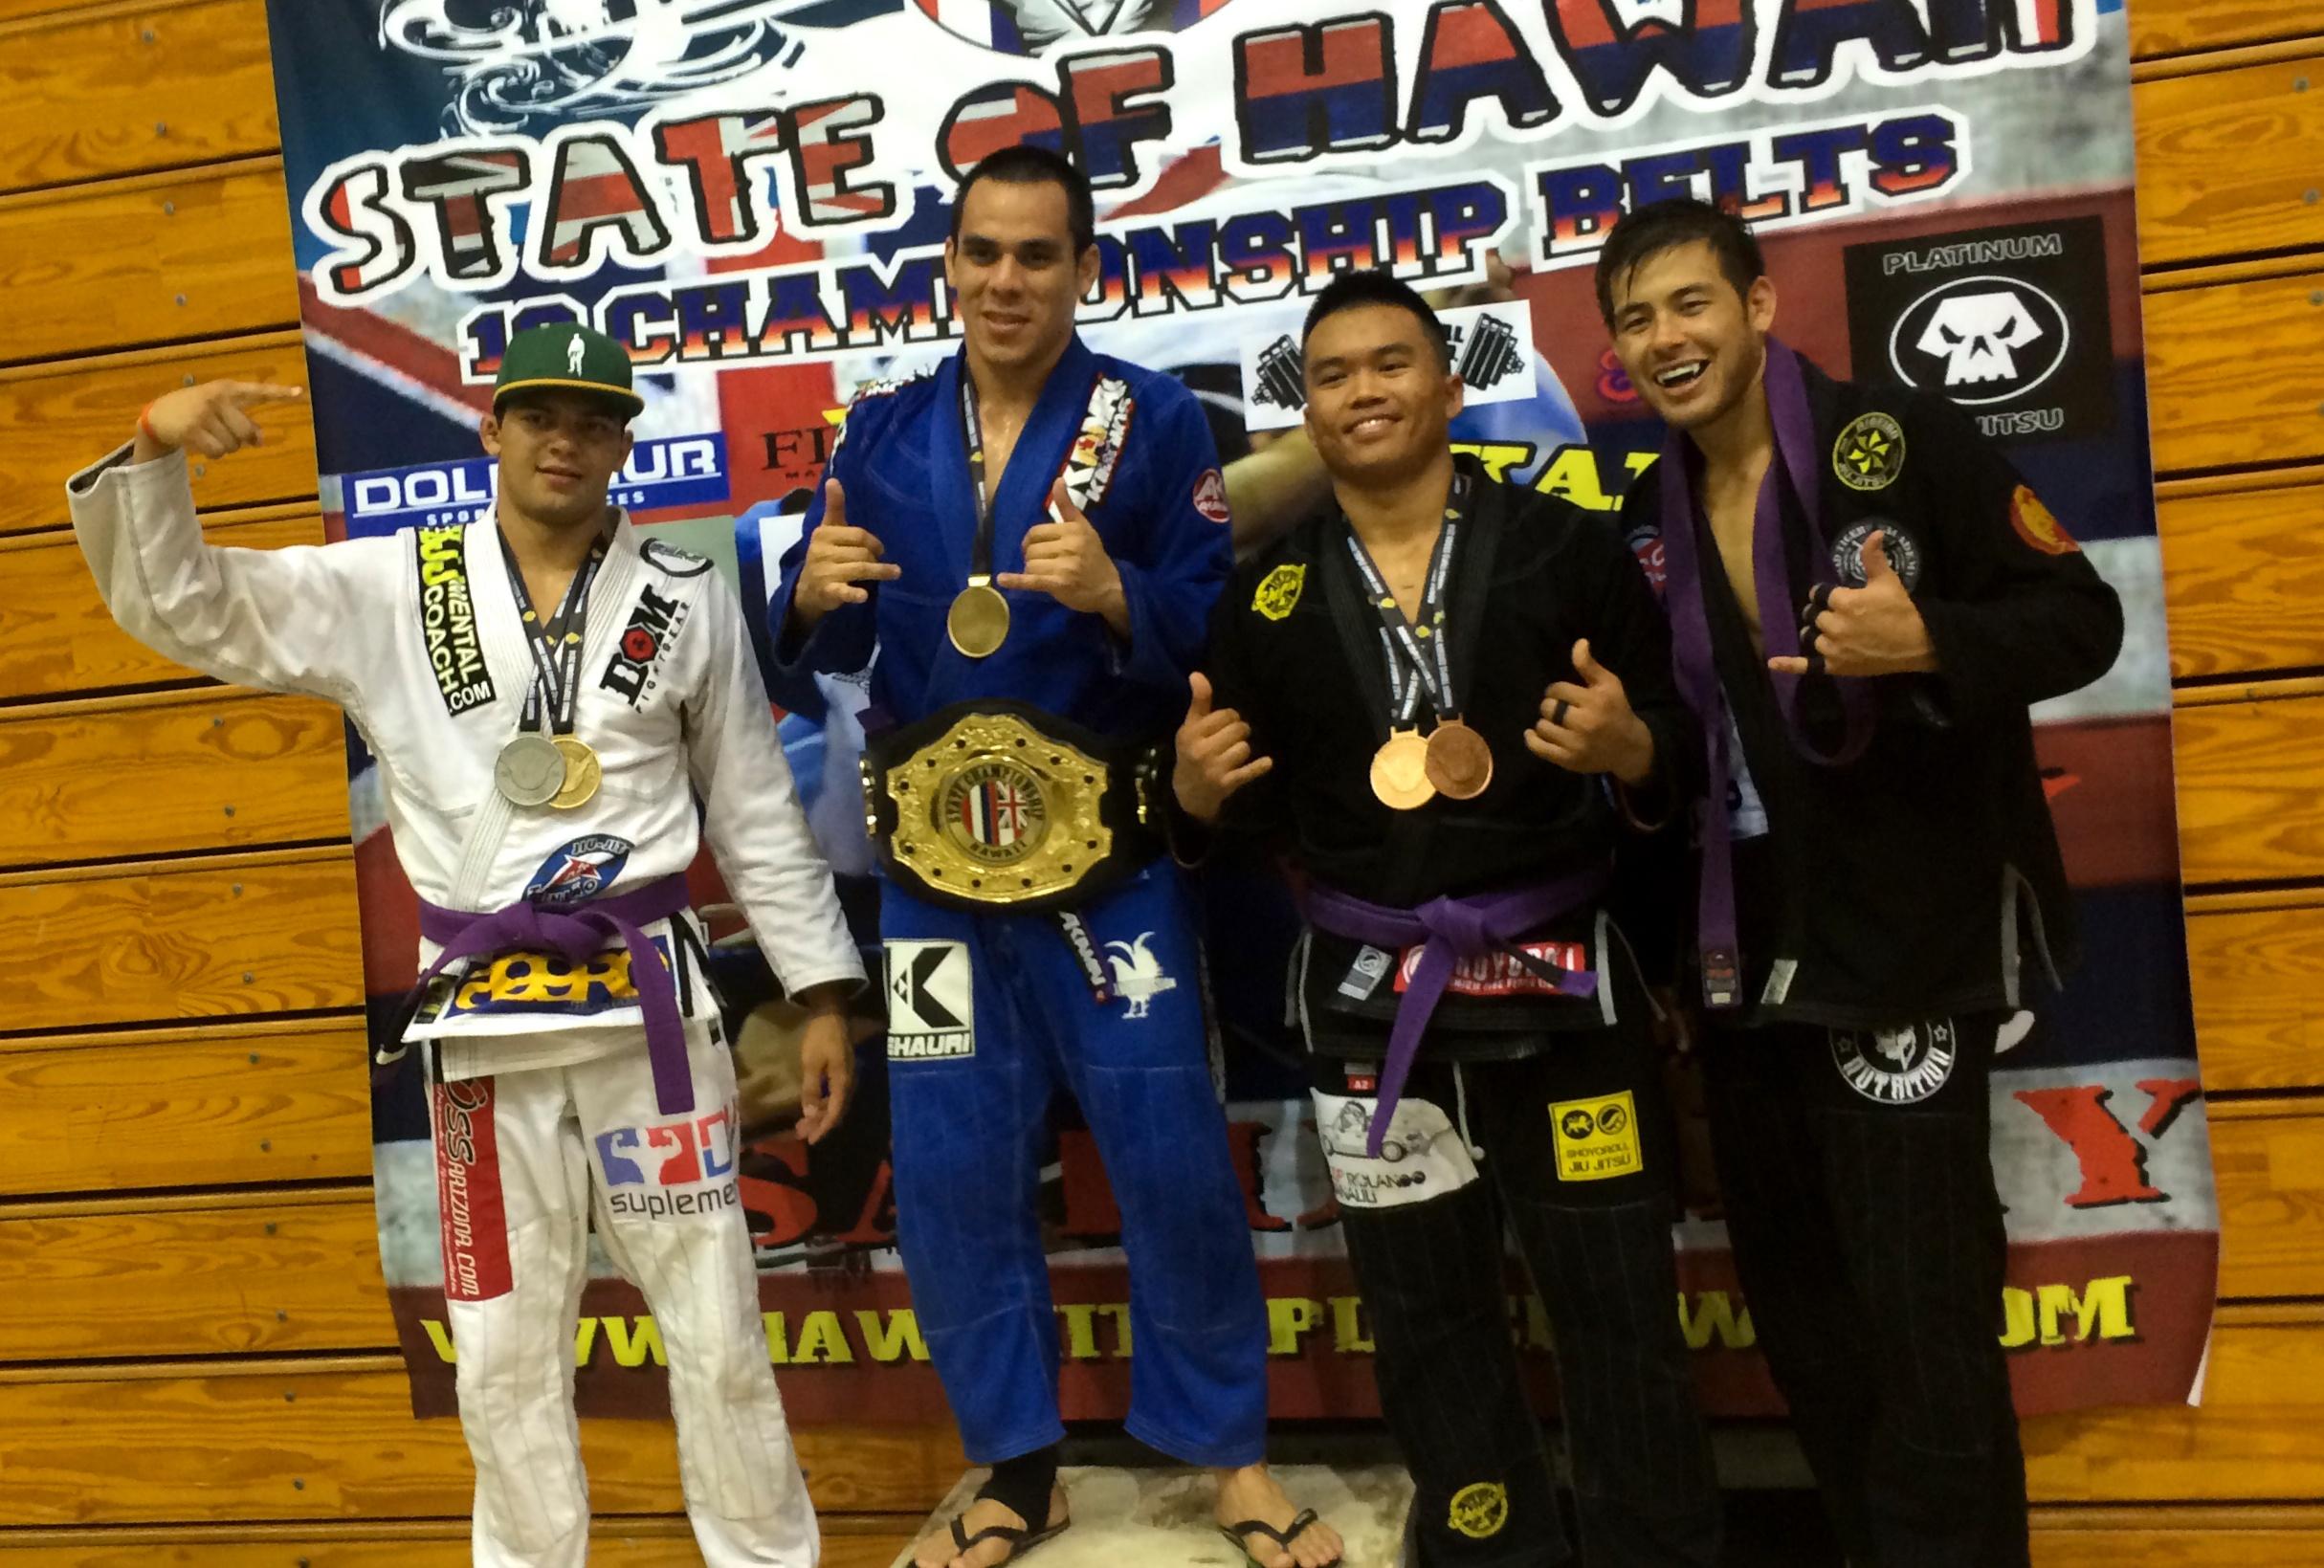 Hoanui Vanaa remporte la plus grosse compet' de jiu jitsu à Hawaii